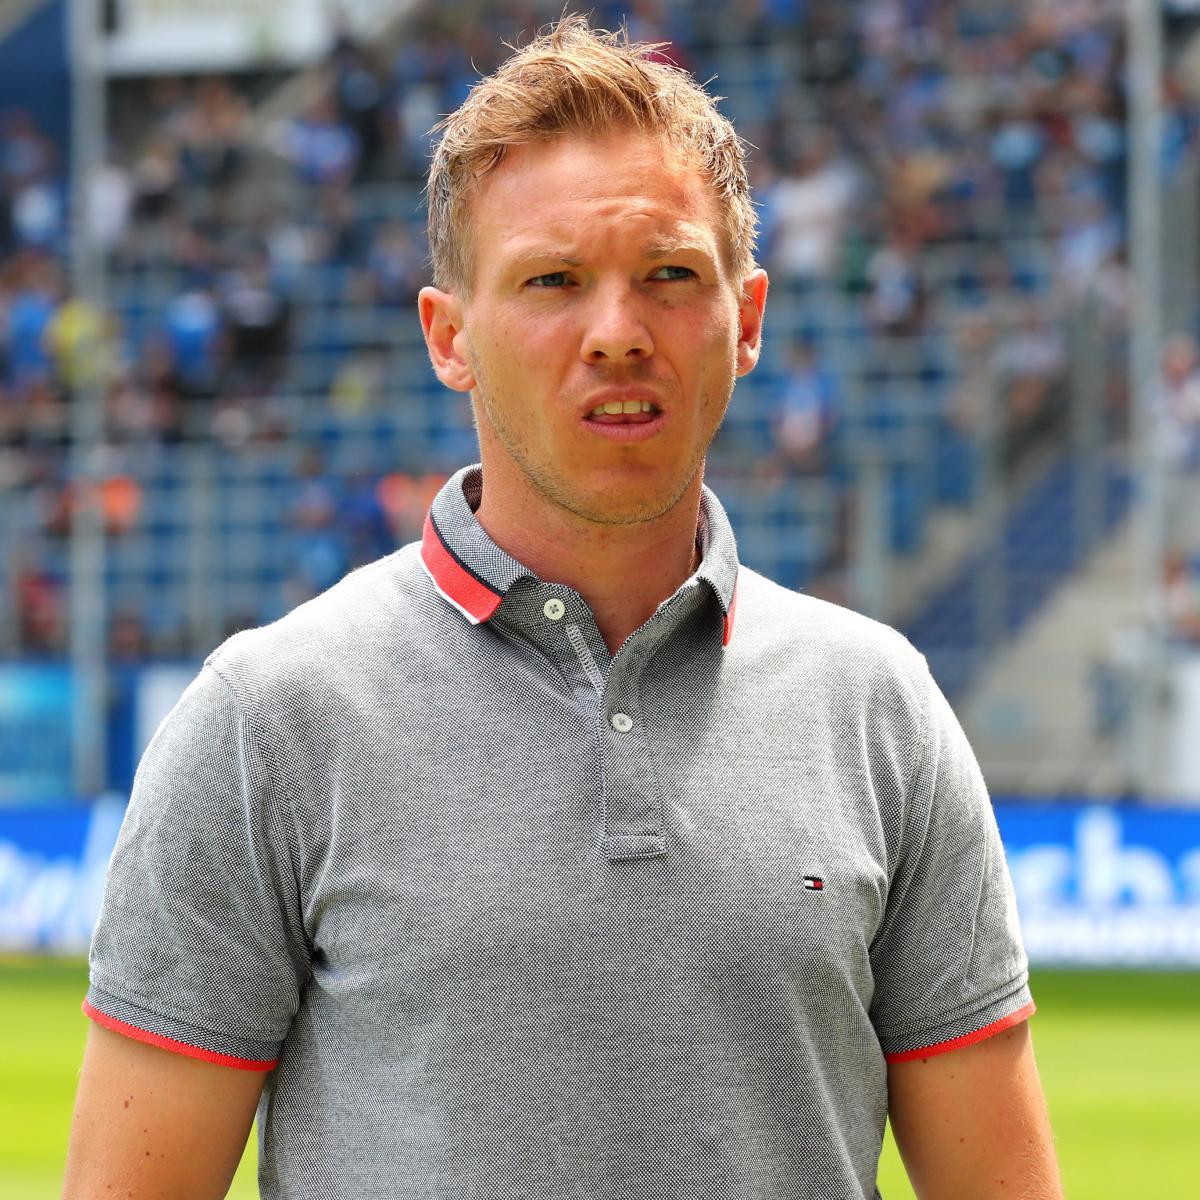 Julian Nagelsmann to Leave Hoffenheim After 2018-19 Season for RB Leipzig  Job | Bleacher Report | Latest News, Videos and Highlights